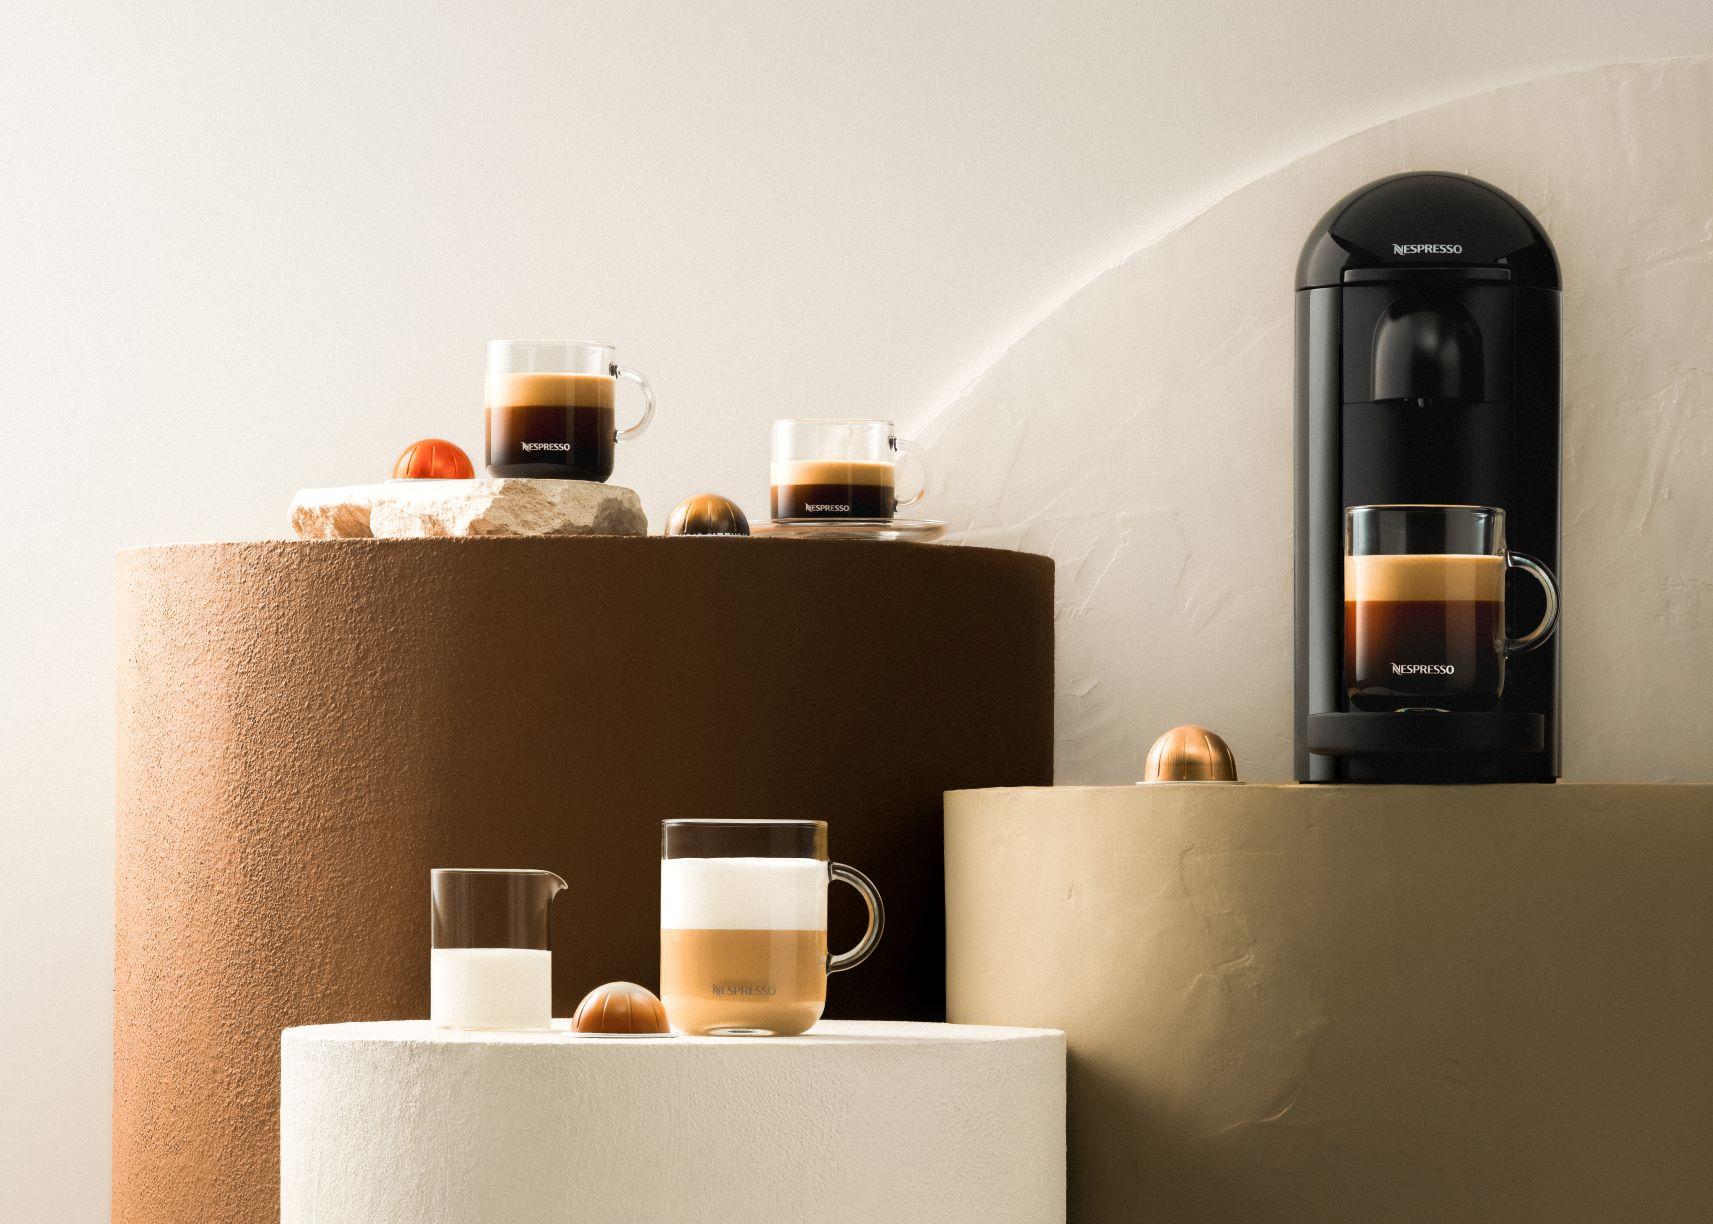 H Nespresso παρουσιάζει τη Vertuo Carafe  για καφέ με την παρέα με μία μόνο κάψουλα